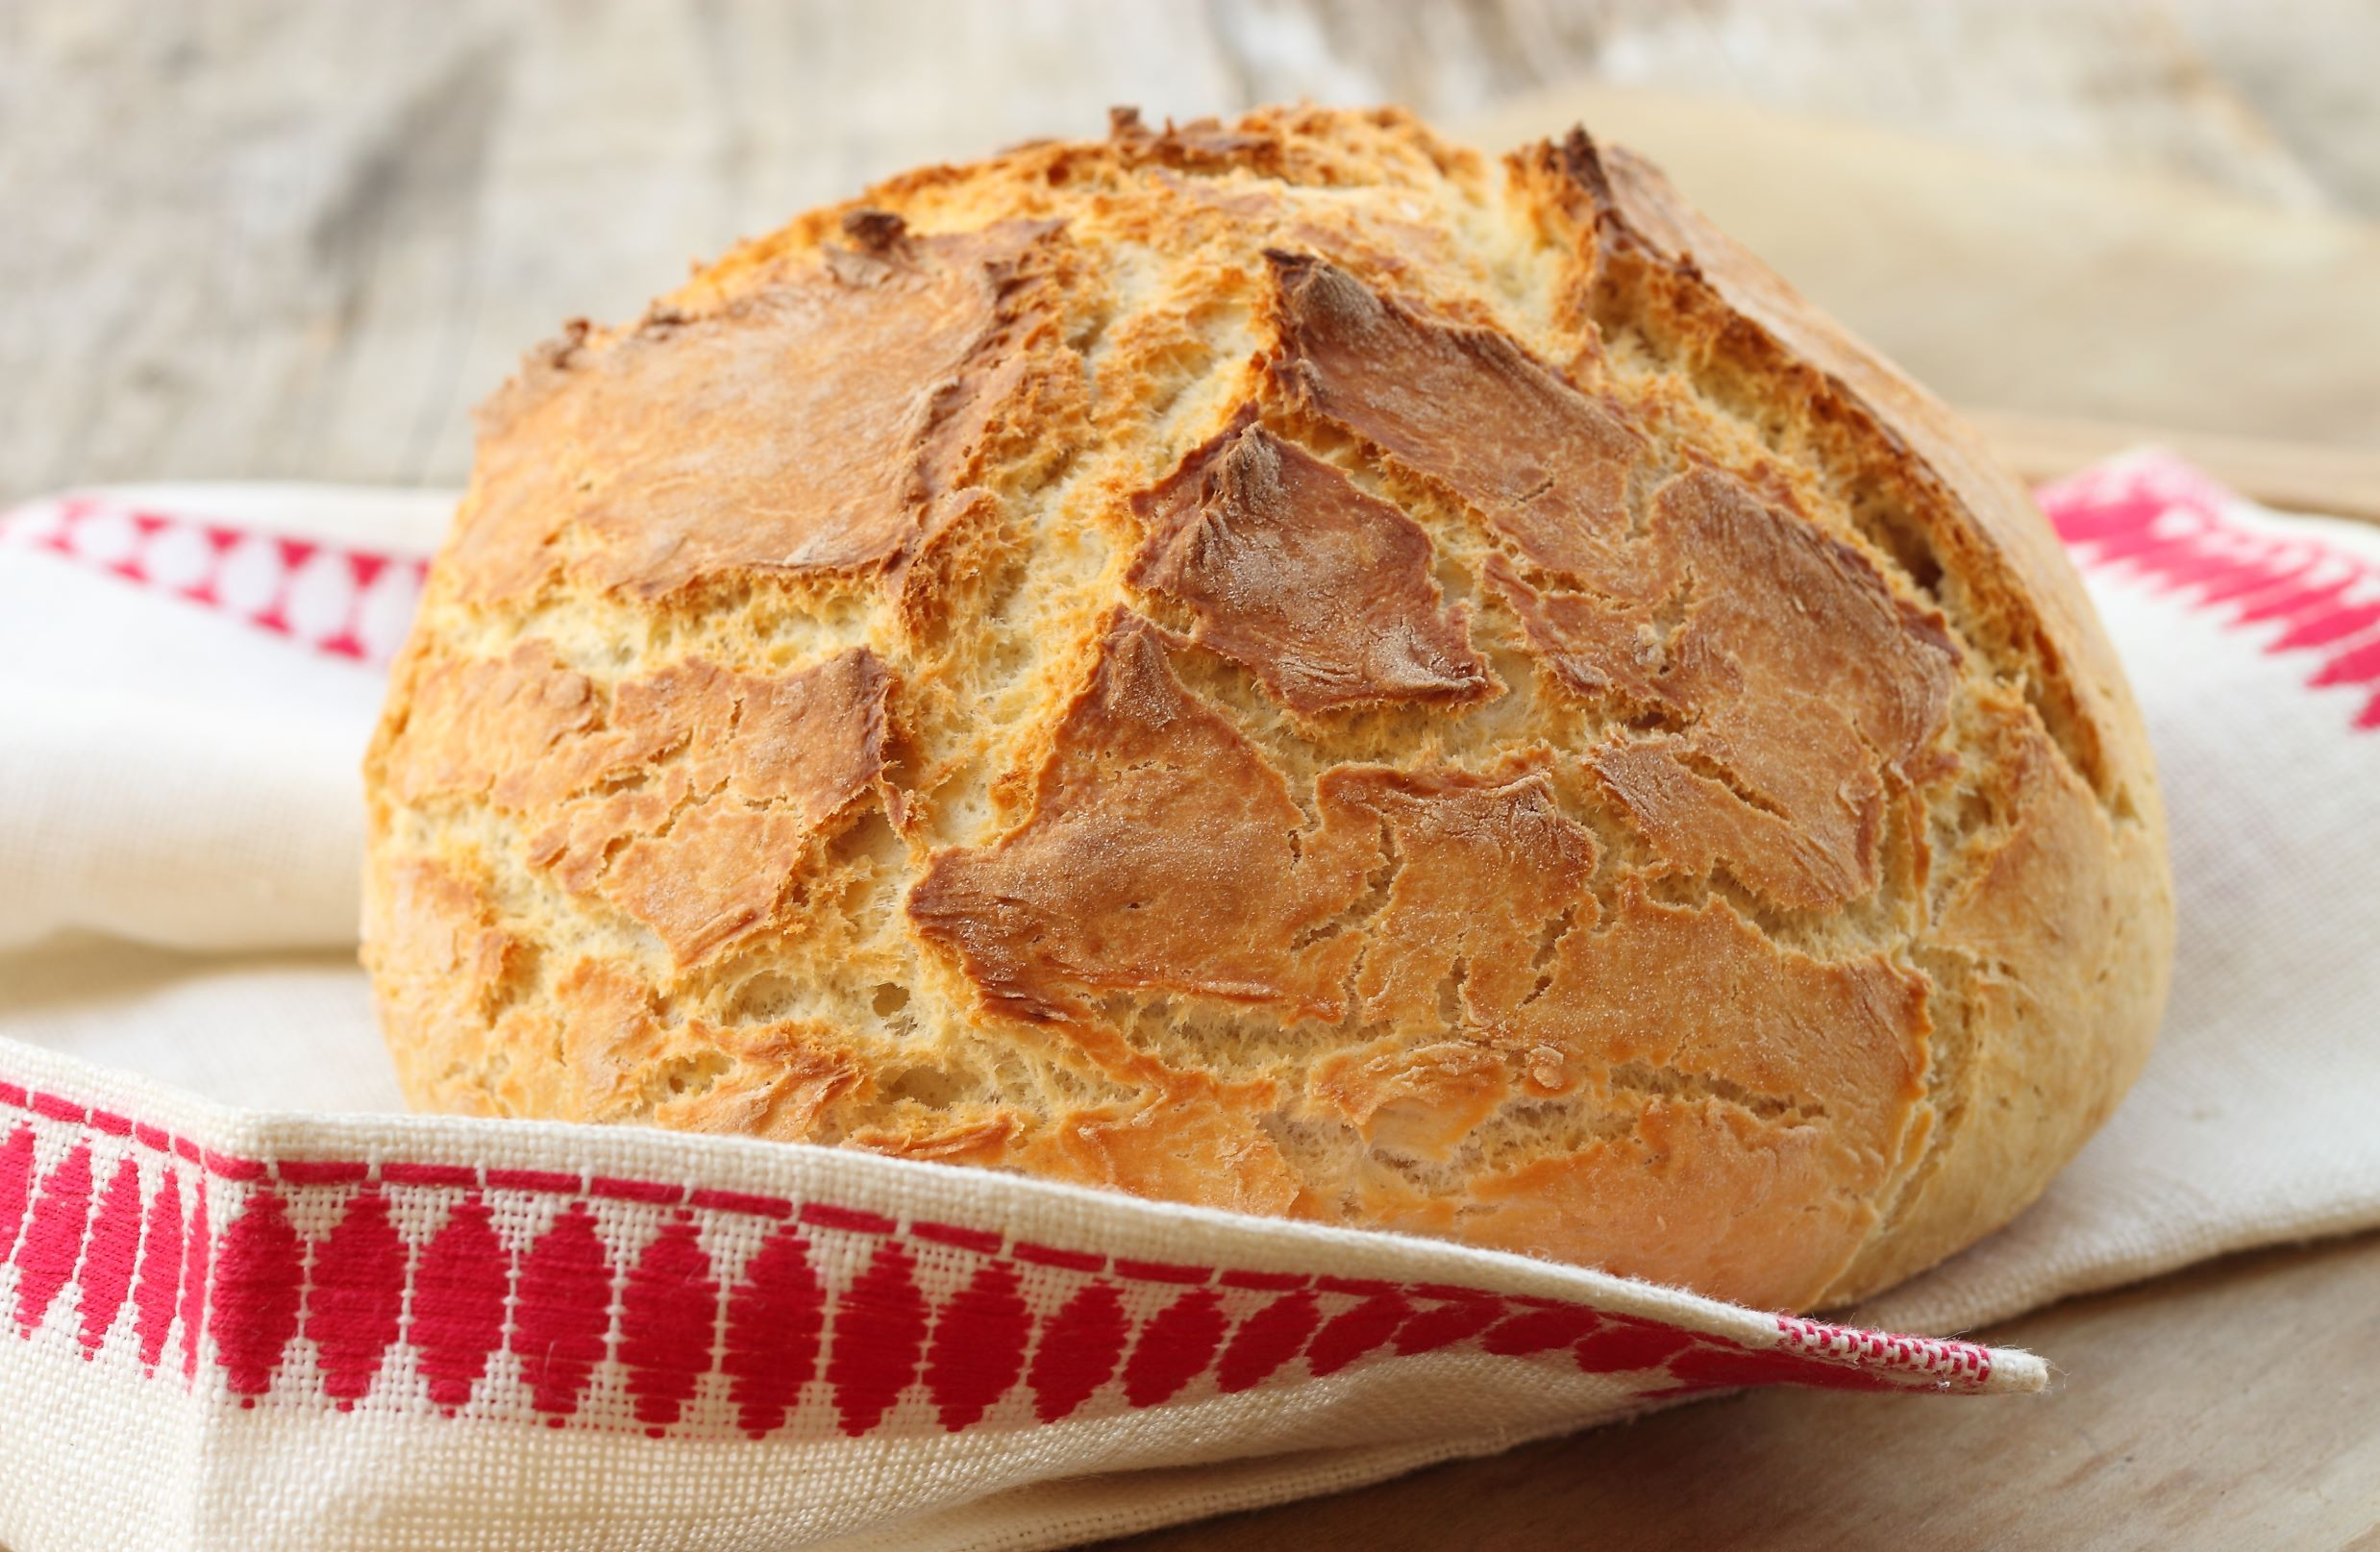 Vegan Gluten Free Soda Bread